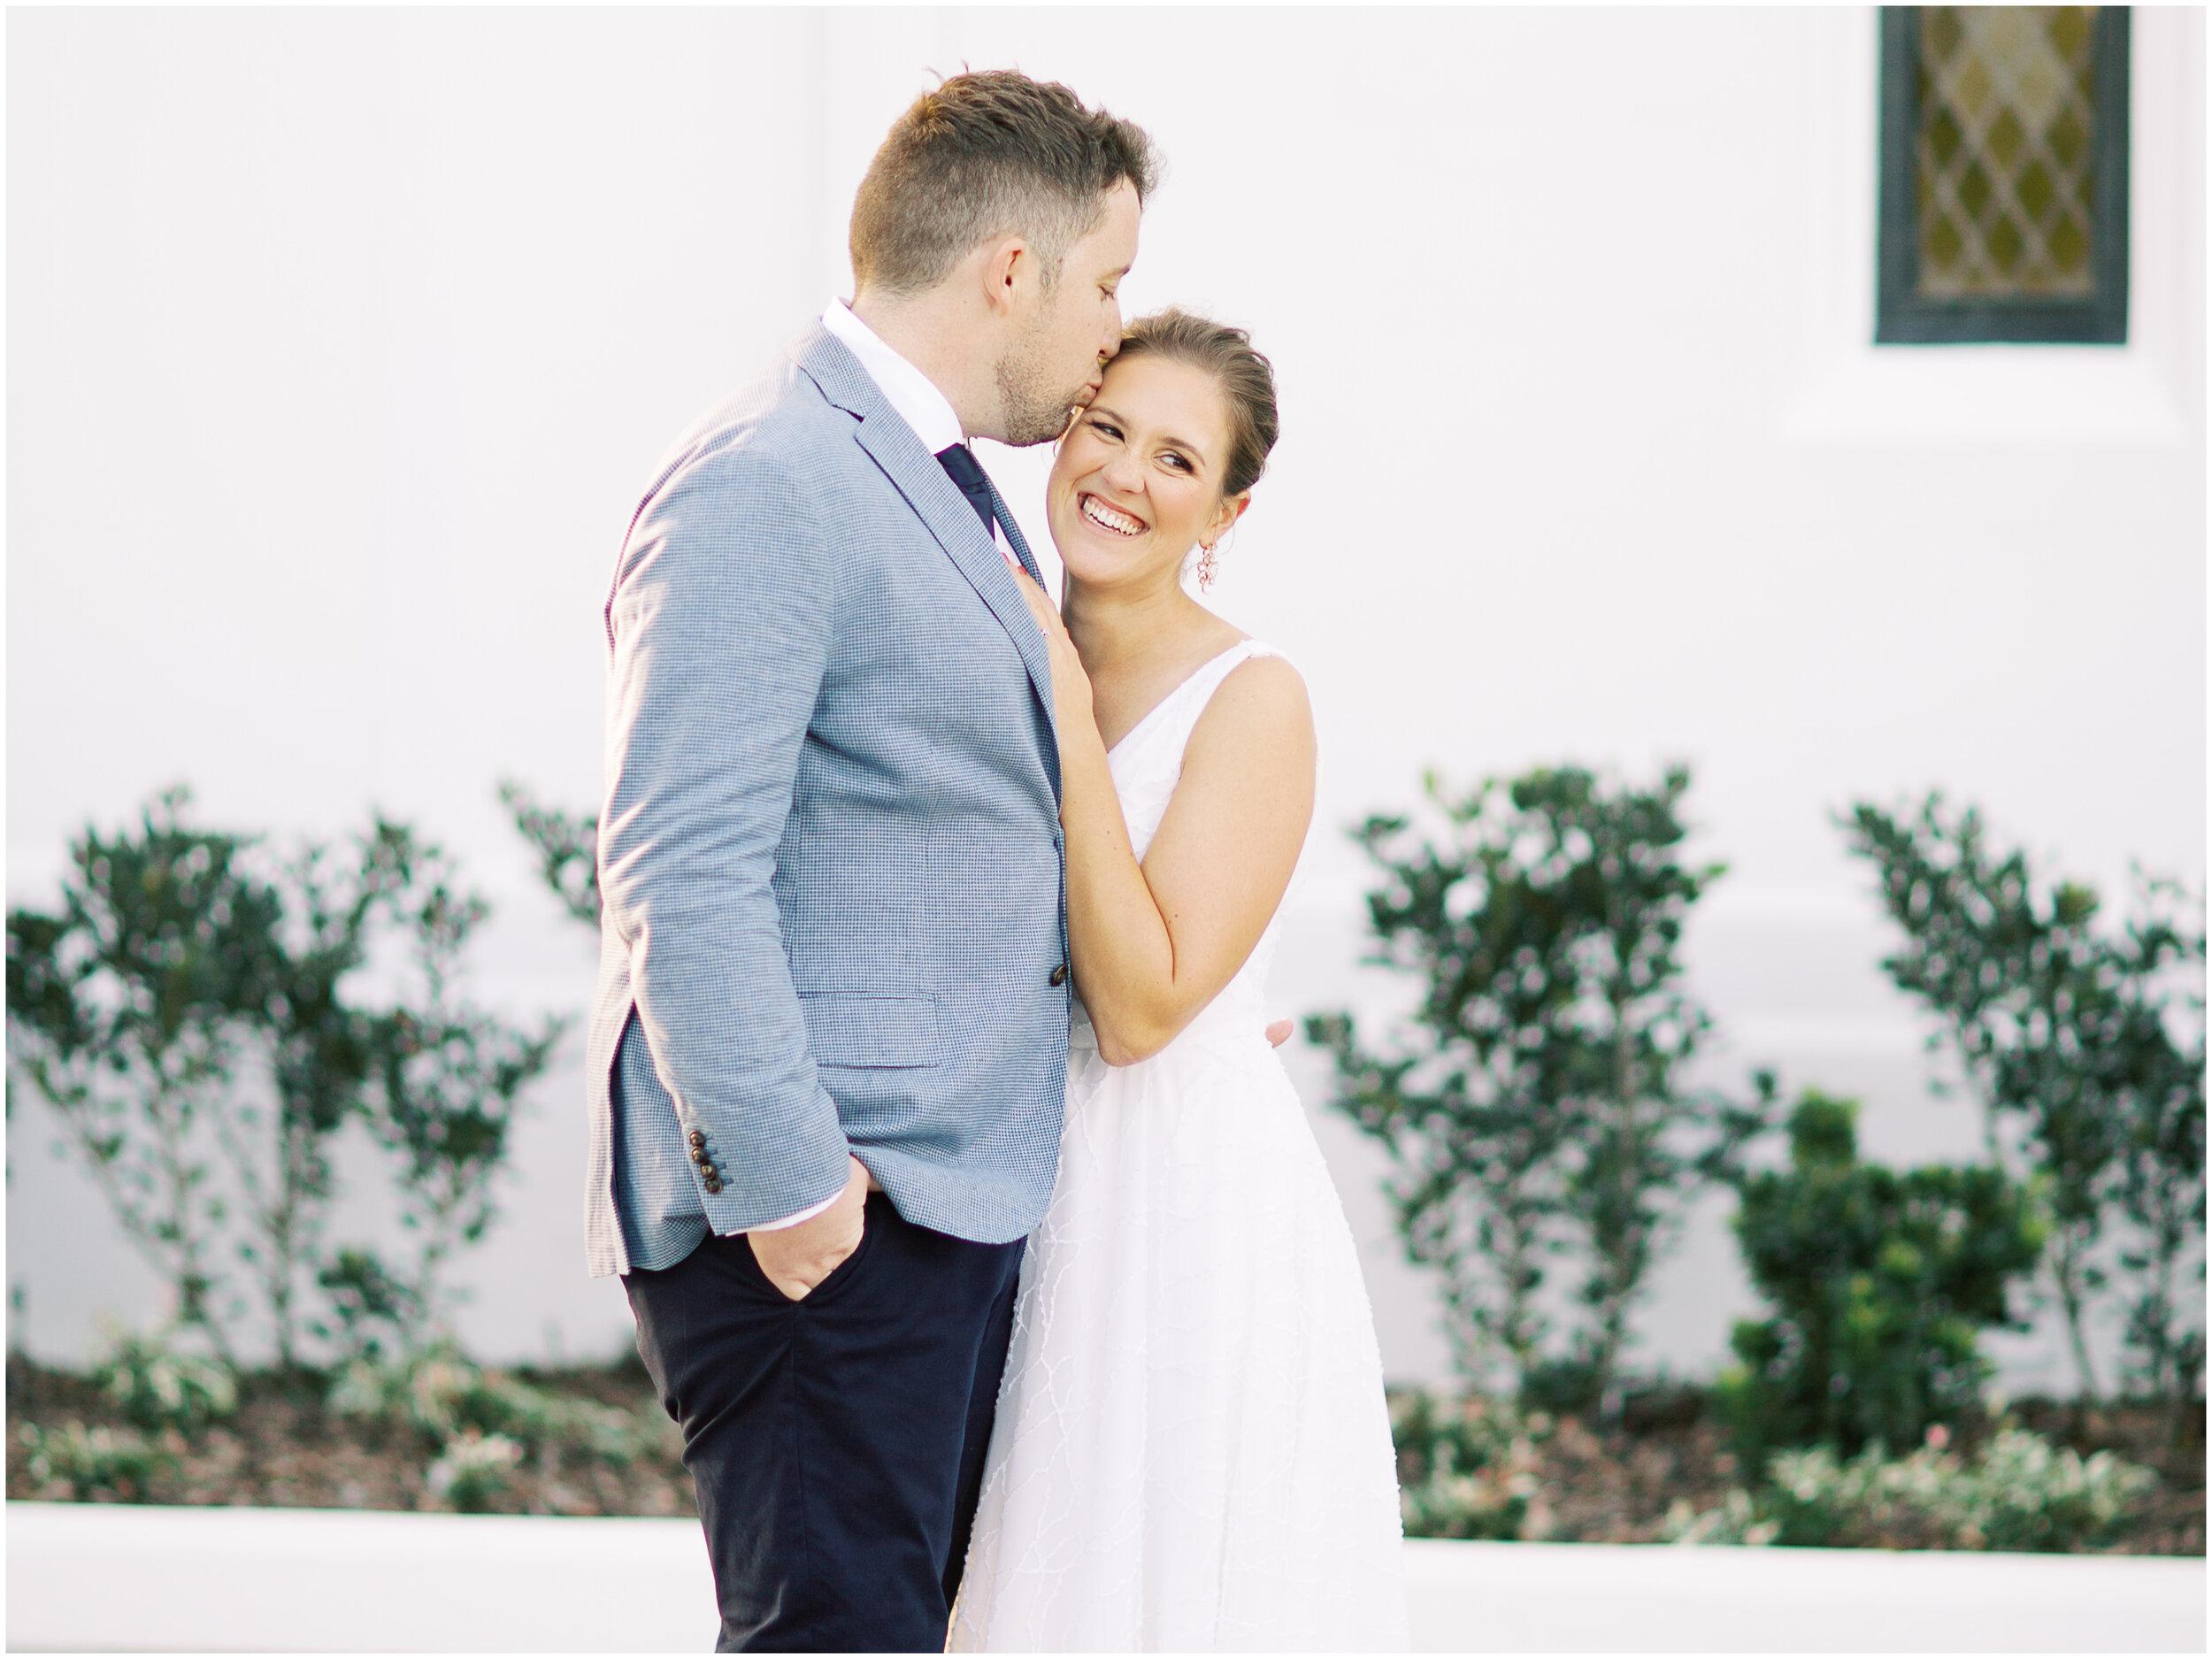 fine-art-australian-destination-wedding-photographer-26.jpg